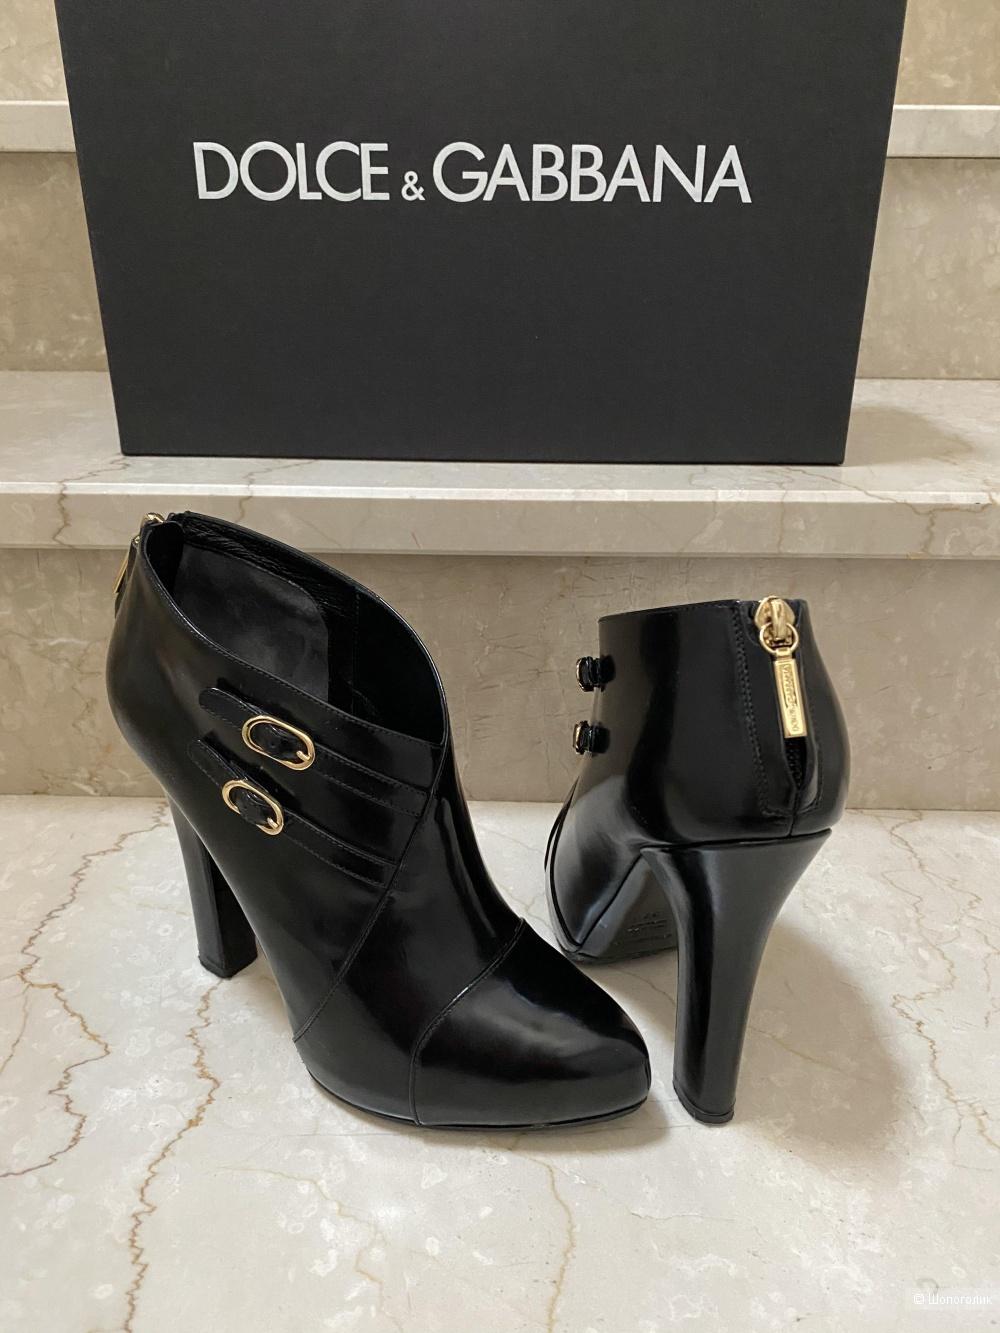 Ботильоны Dolce & Gabbana 37,5 - 37